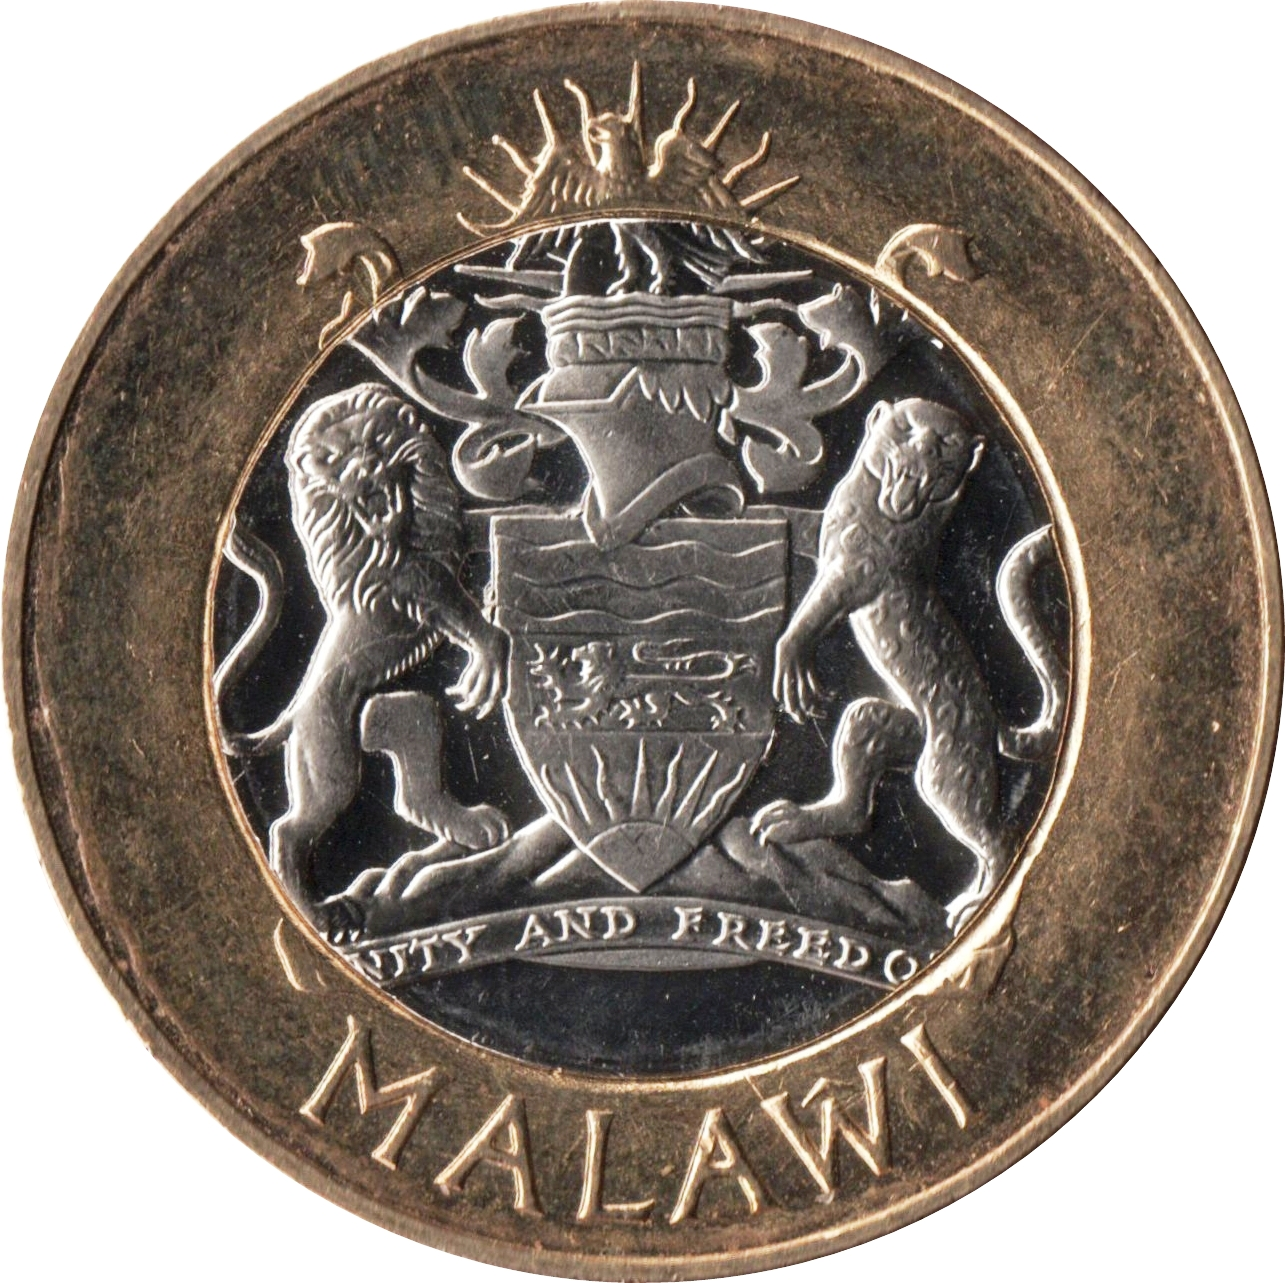 set 9 coins 1 2 5 10 20 50 Tambala 1 5 10 Kwacha 1996-2006 UNC #1 Malawi